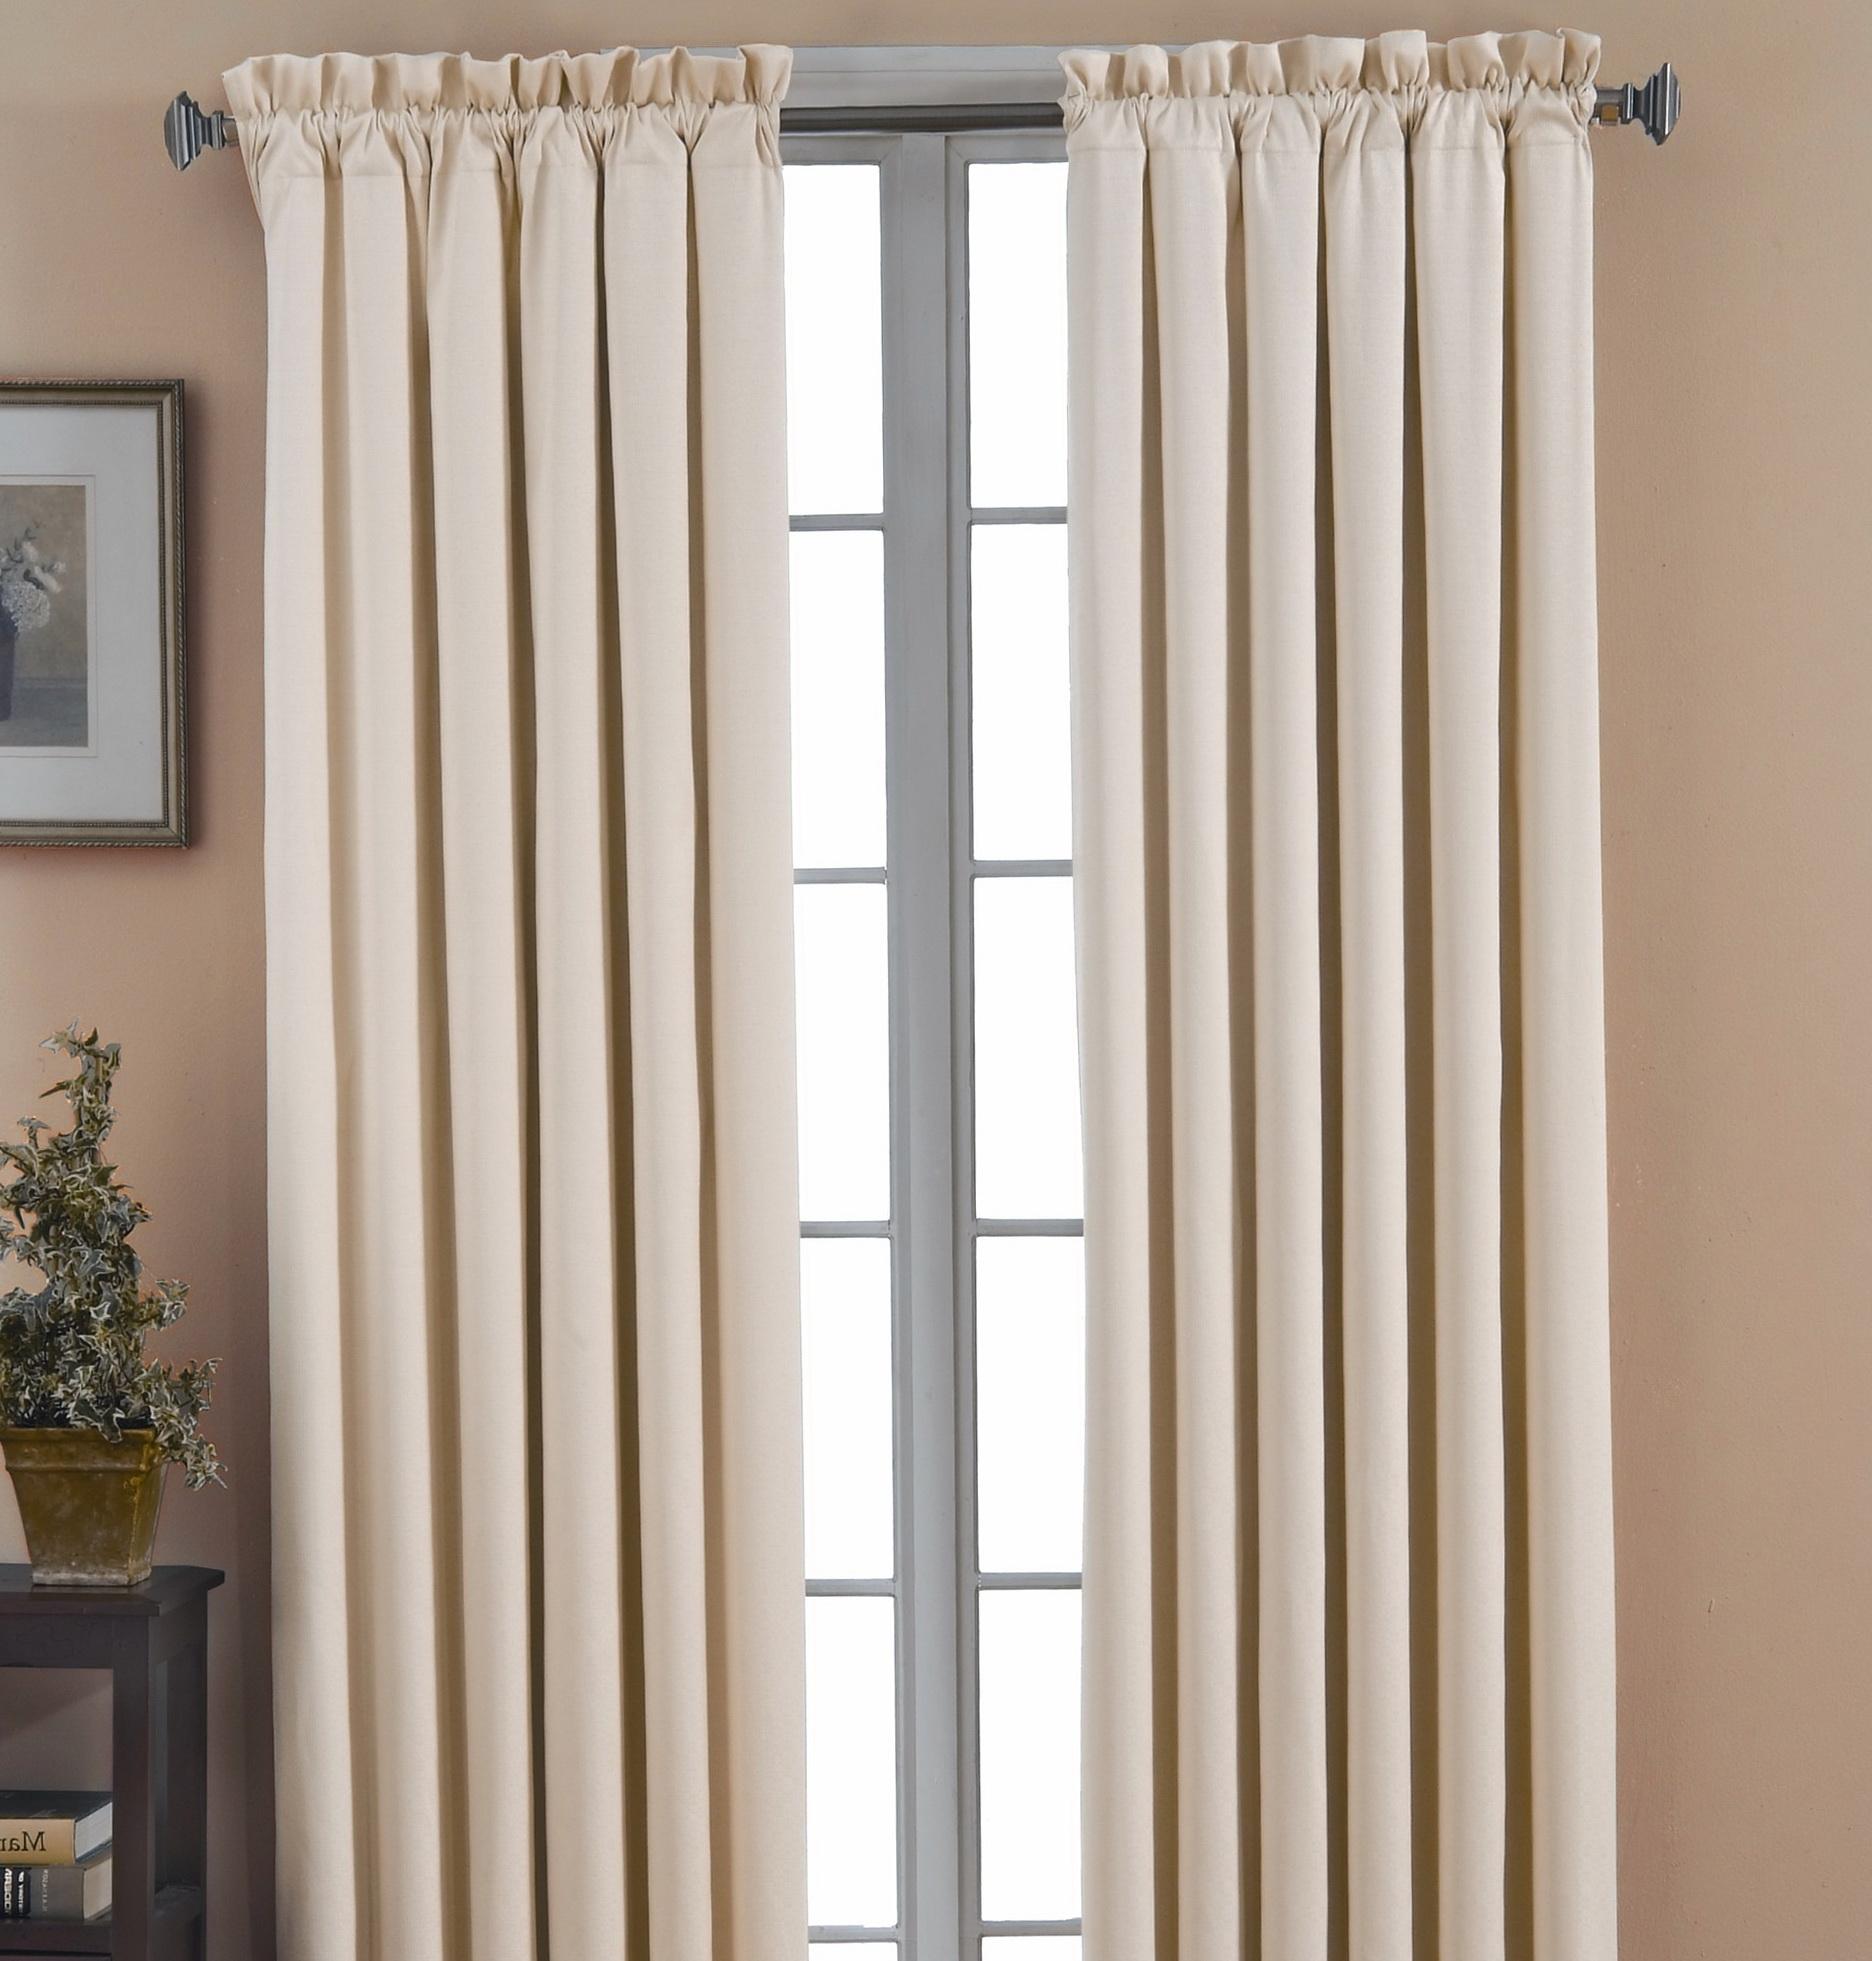 Standard Curtain Lengths And Widths